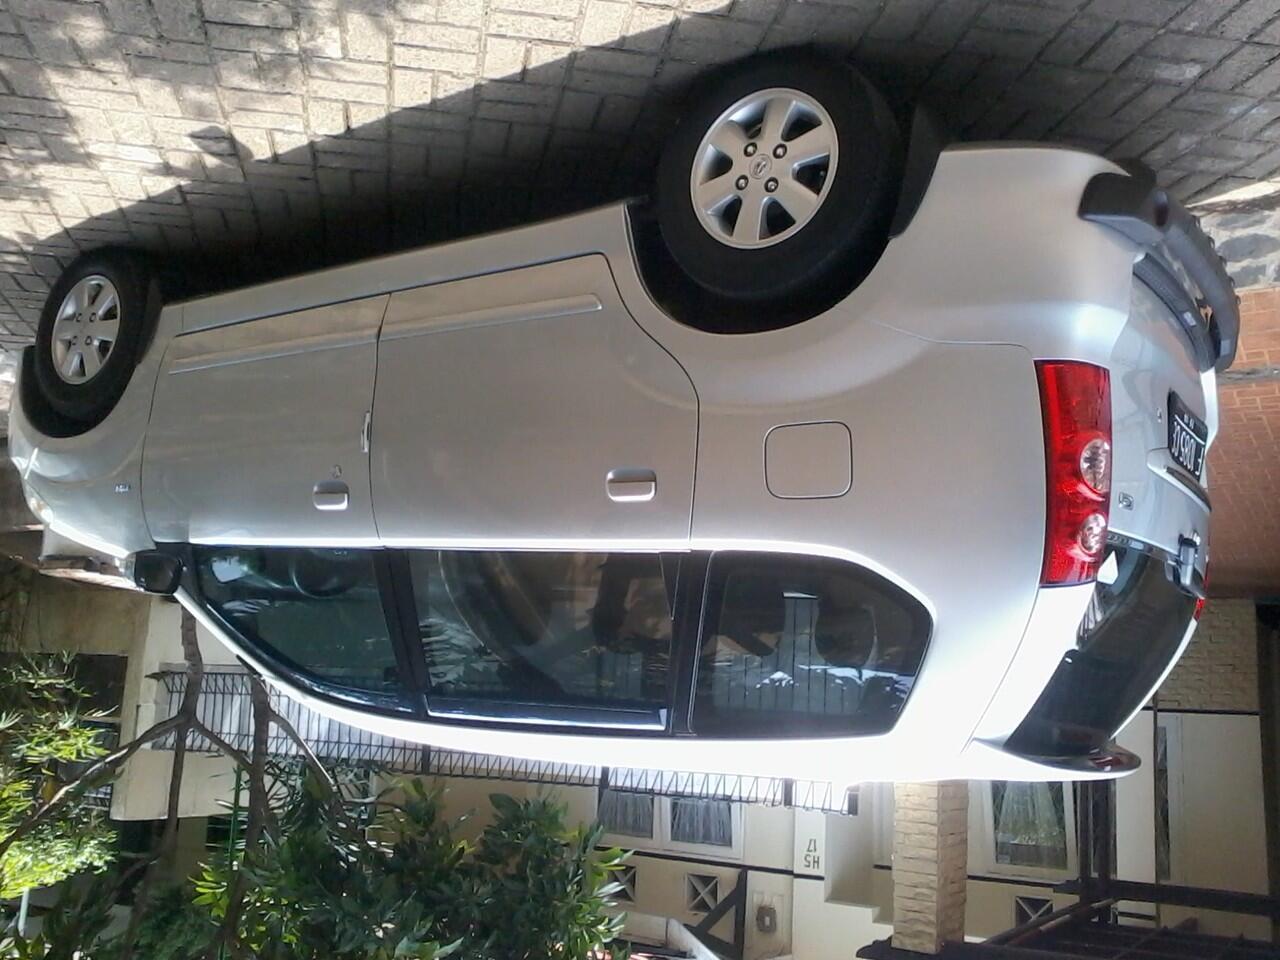 Toyota Avanza 2009 (Plat F Bogor kota)